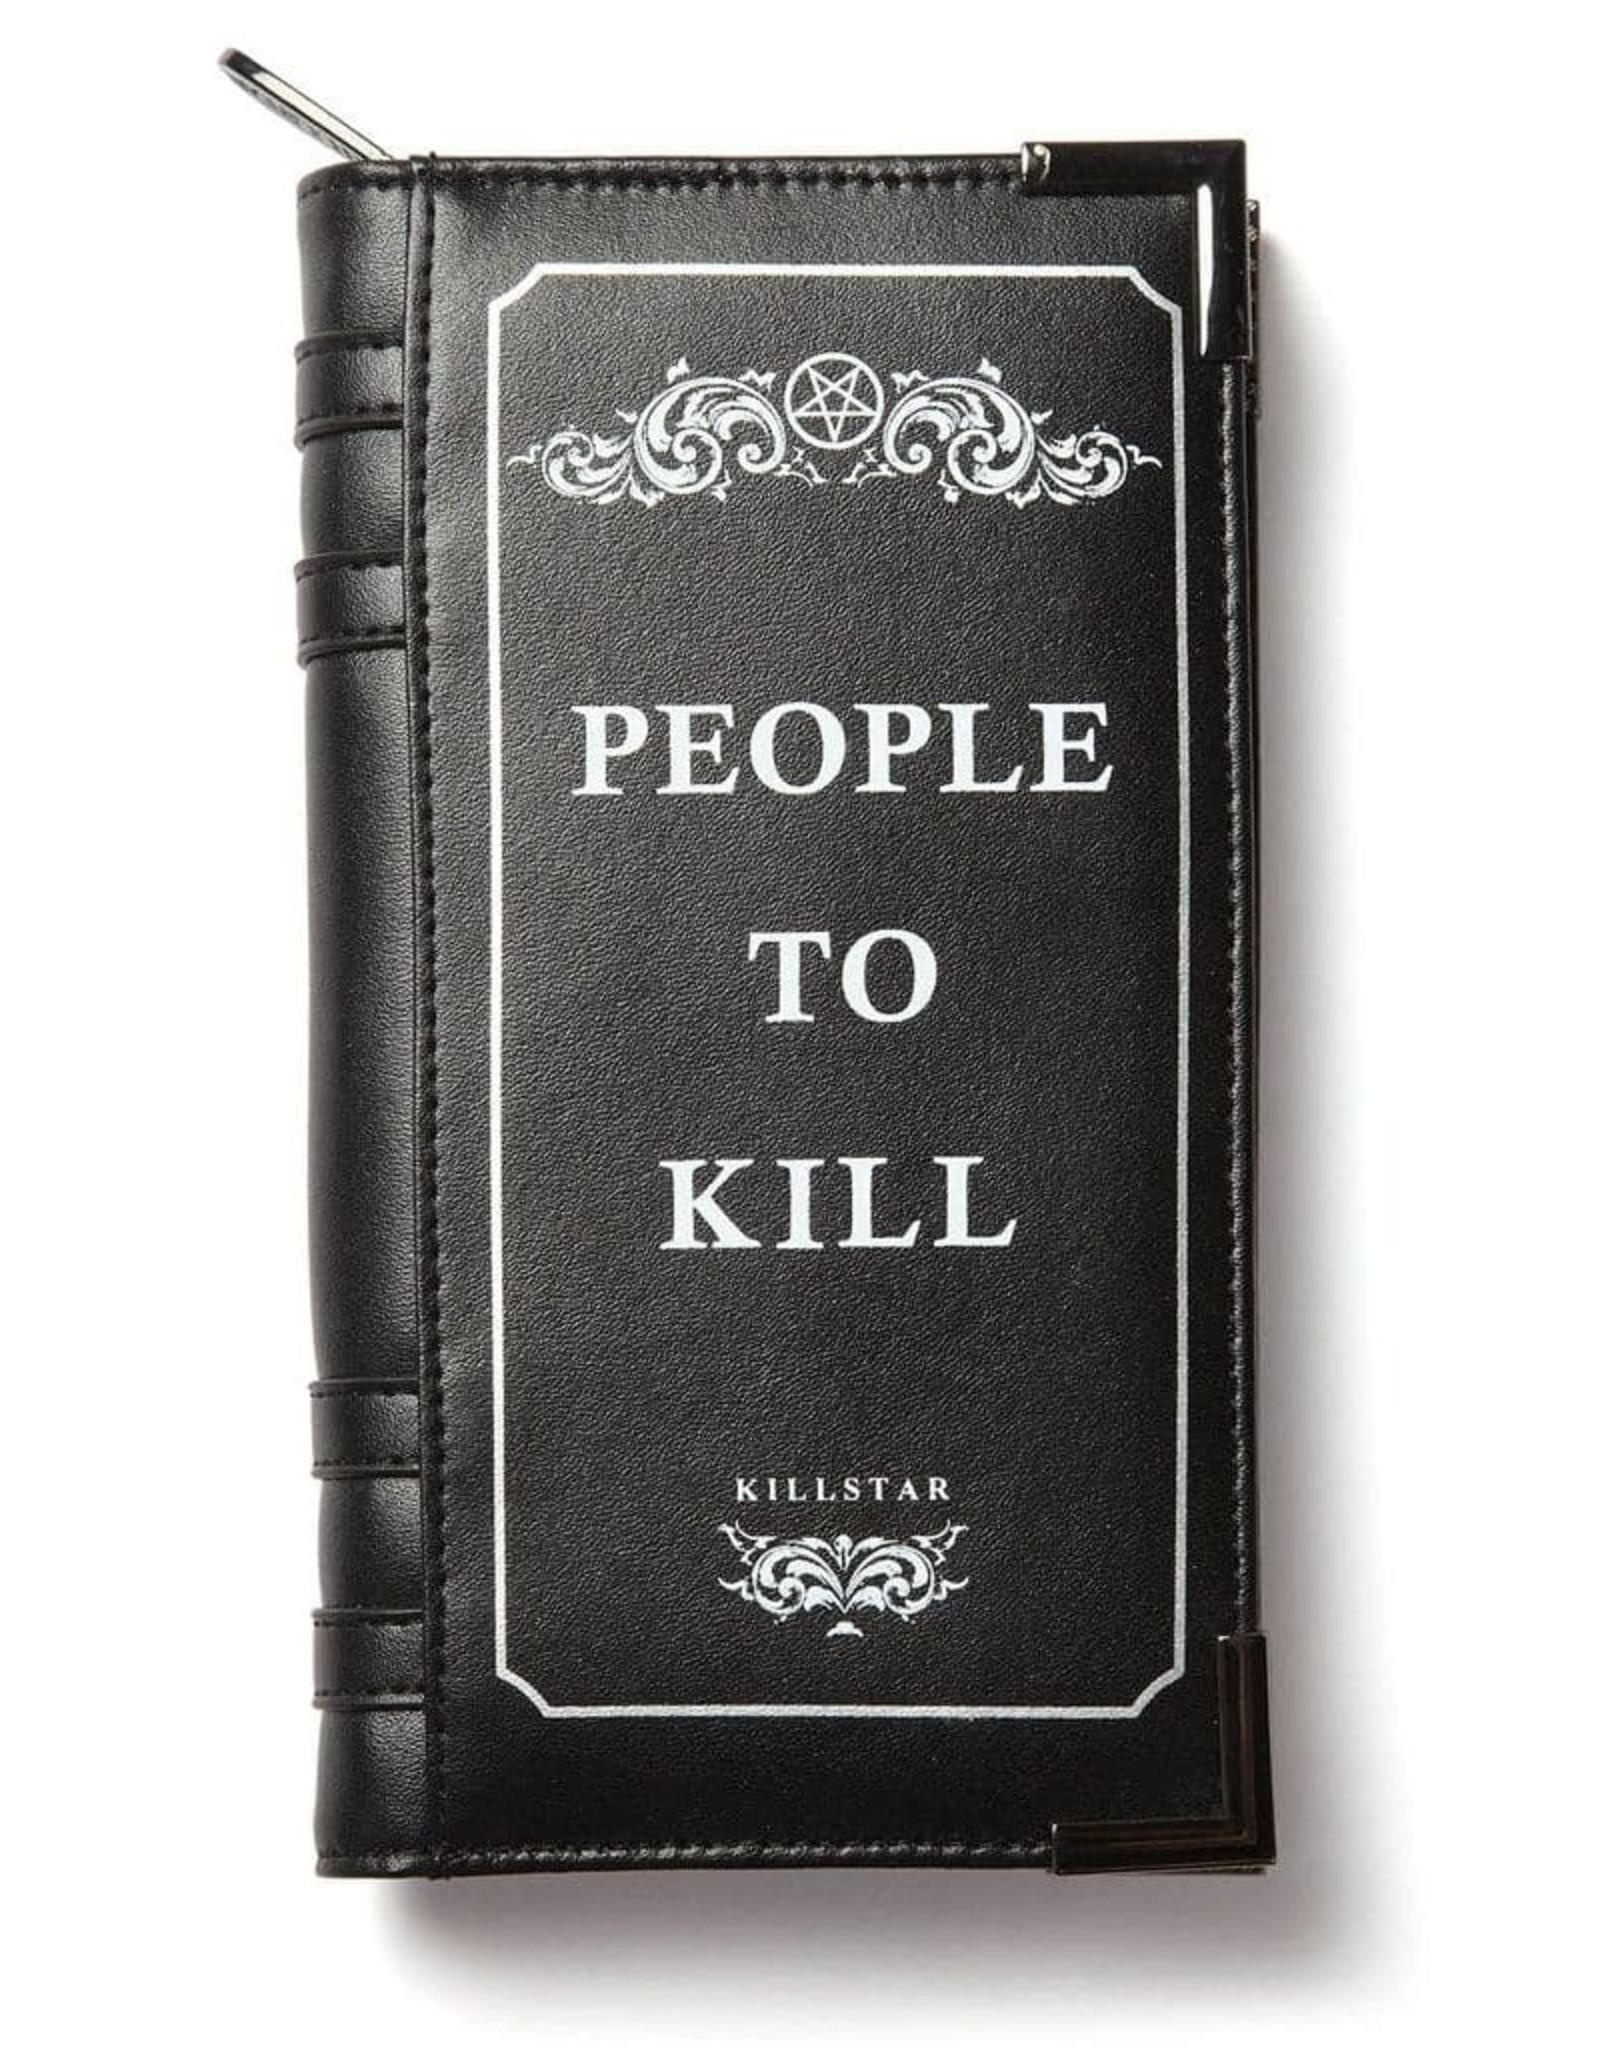 Killstar Gothic portemonnees - Killstar portemonnee People to Kill